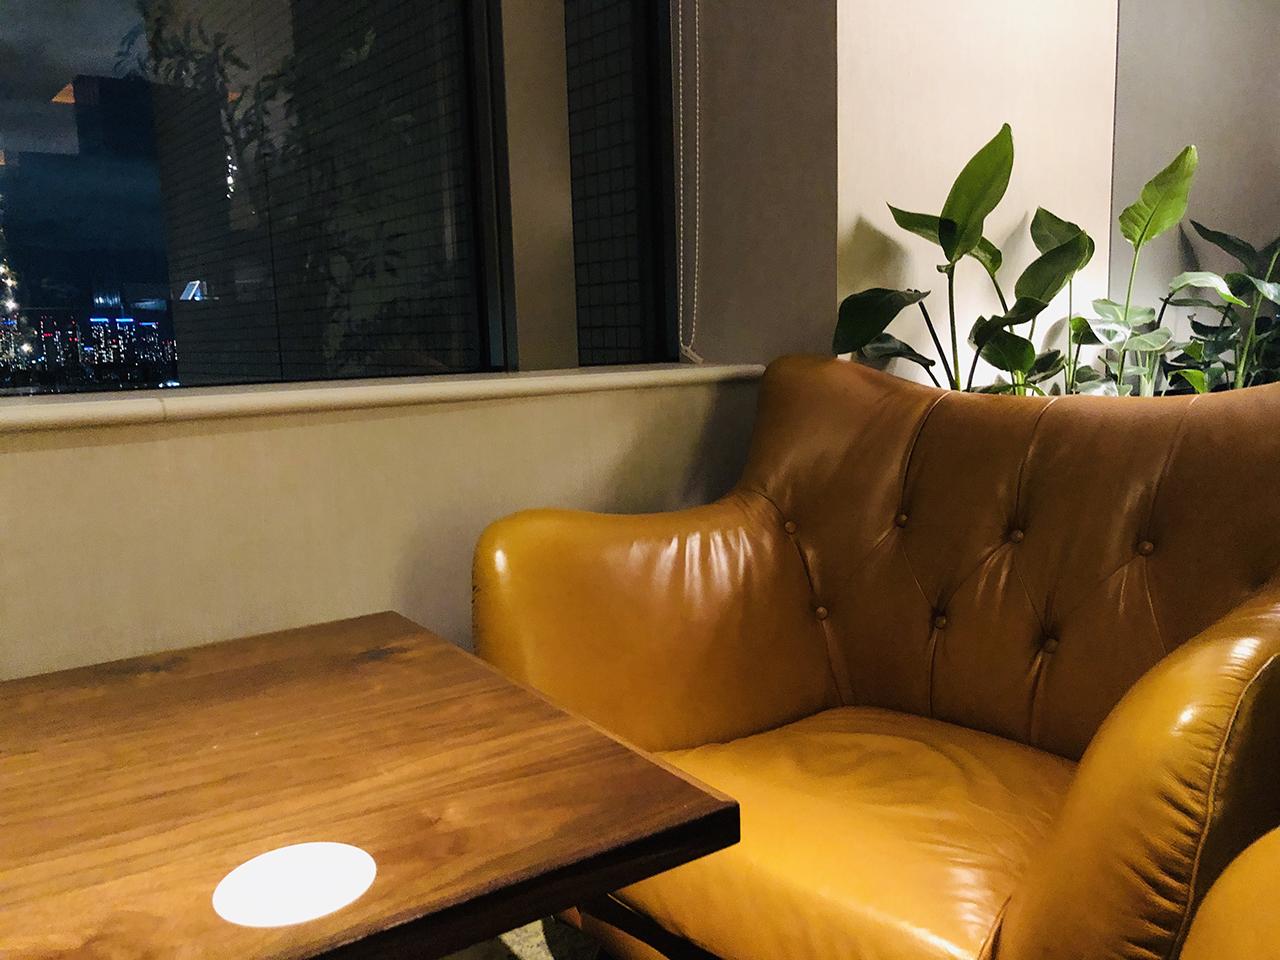 ソファ席の写真